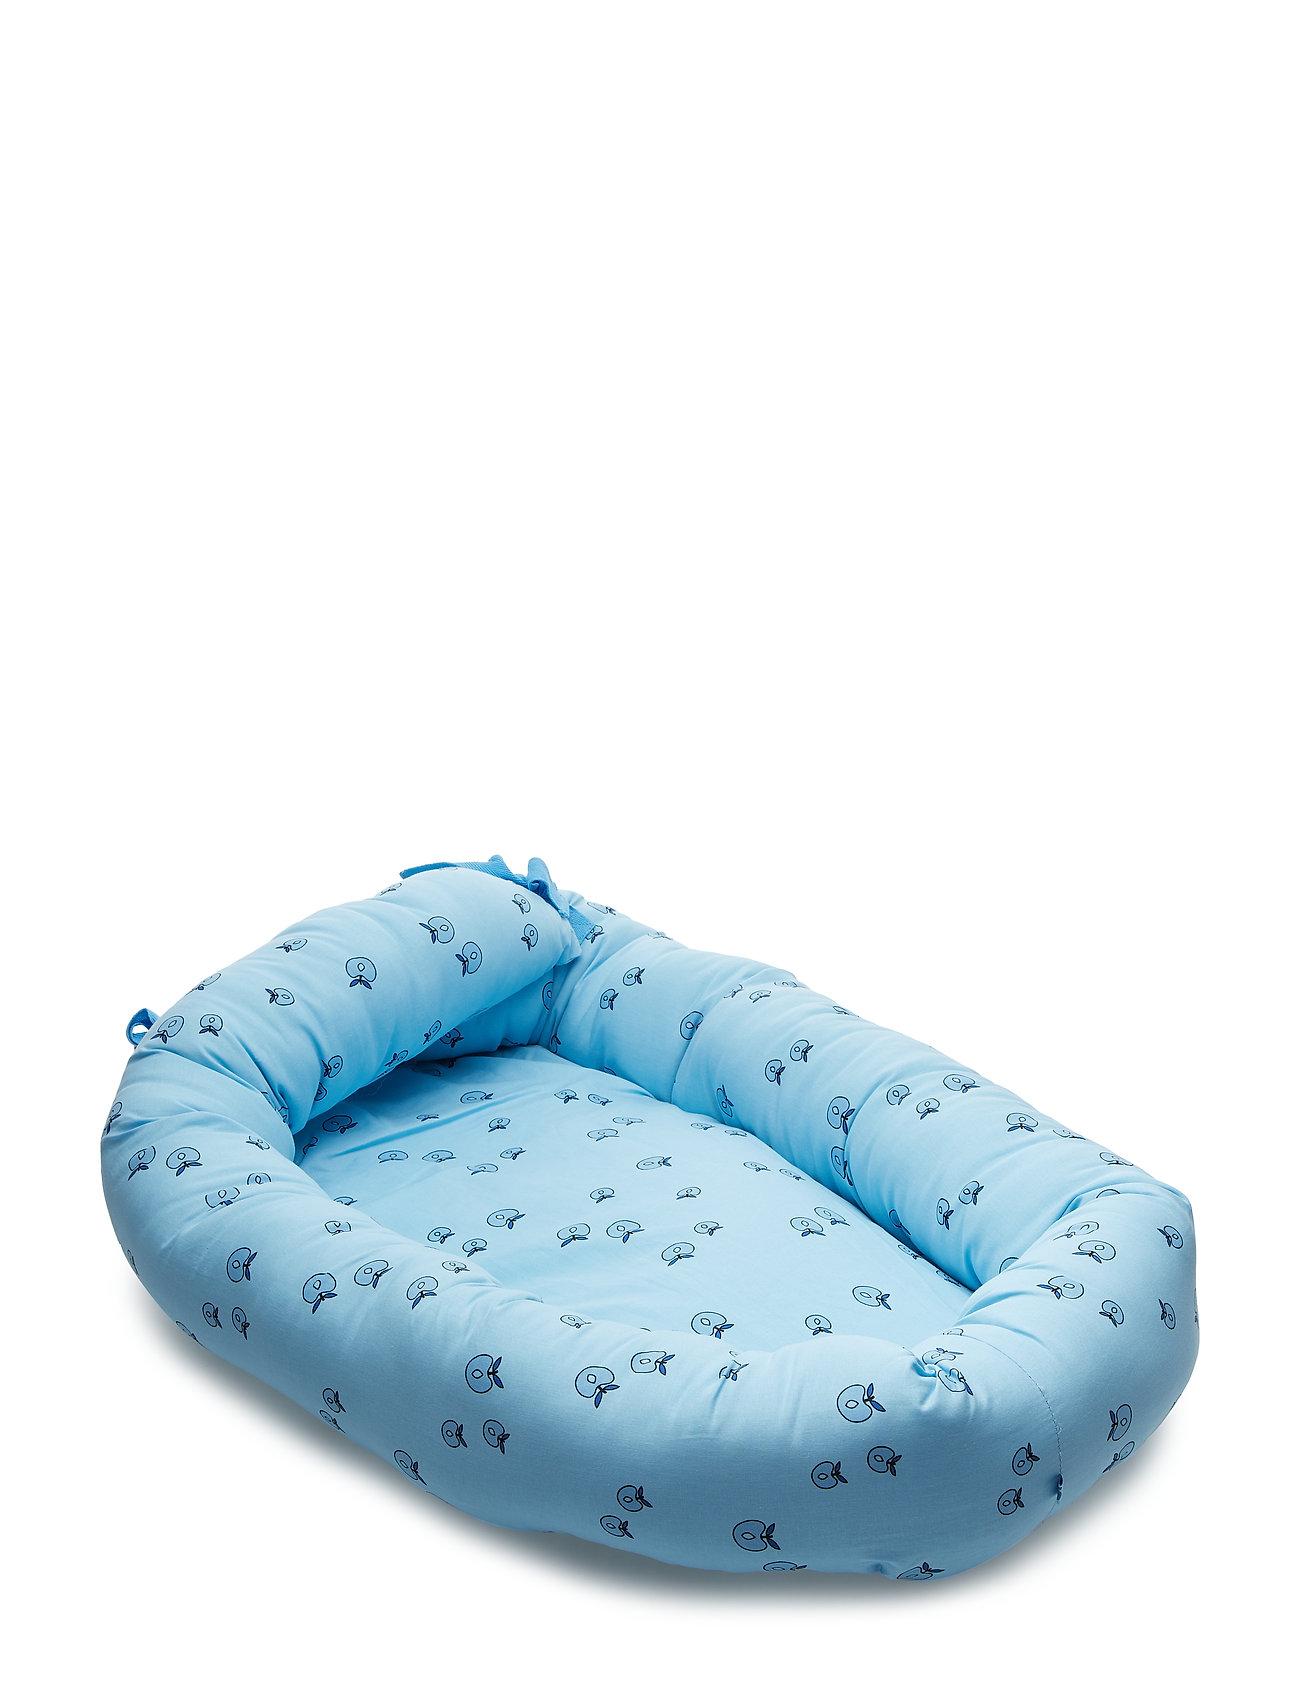 Småfolk Baby Nest. Apple. Originals. - AIR BLUE